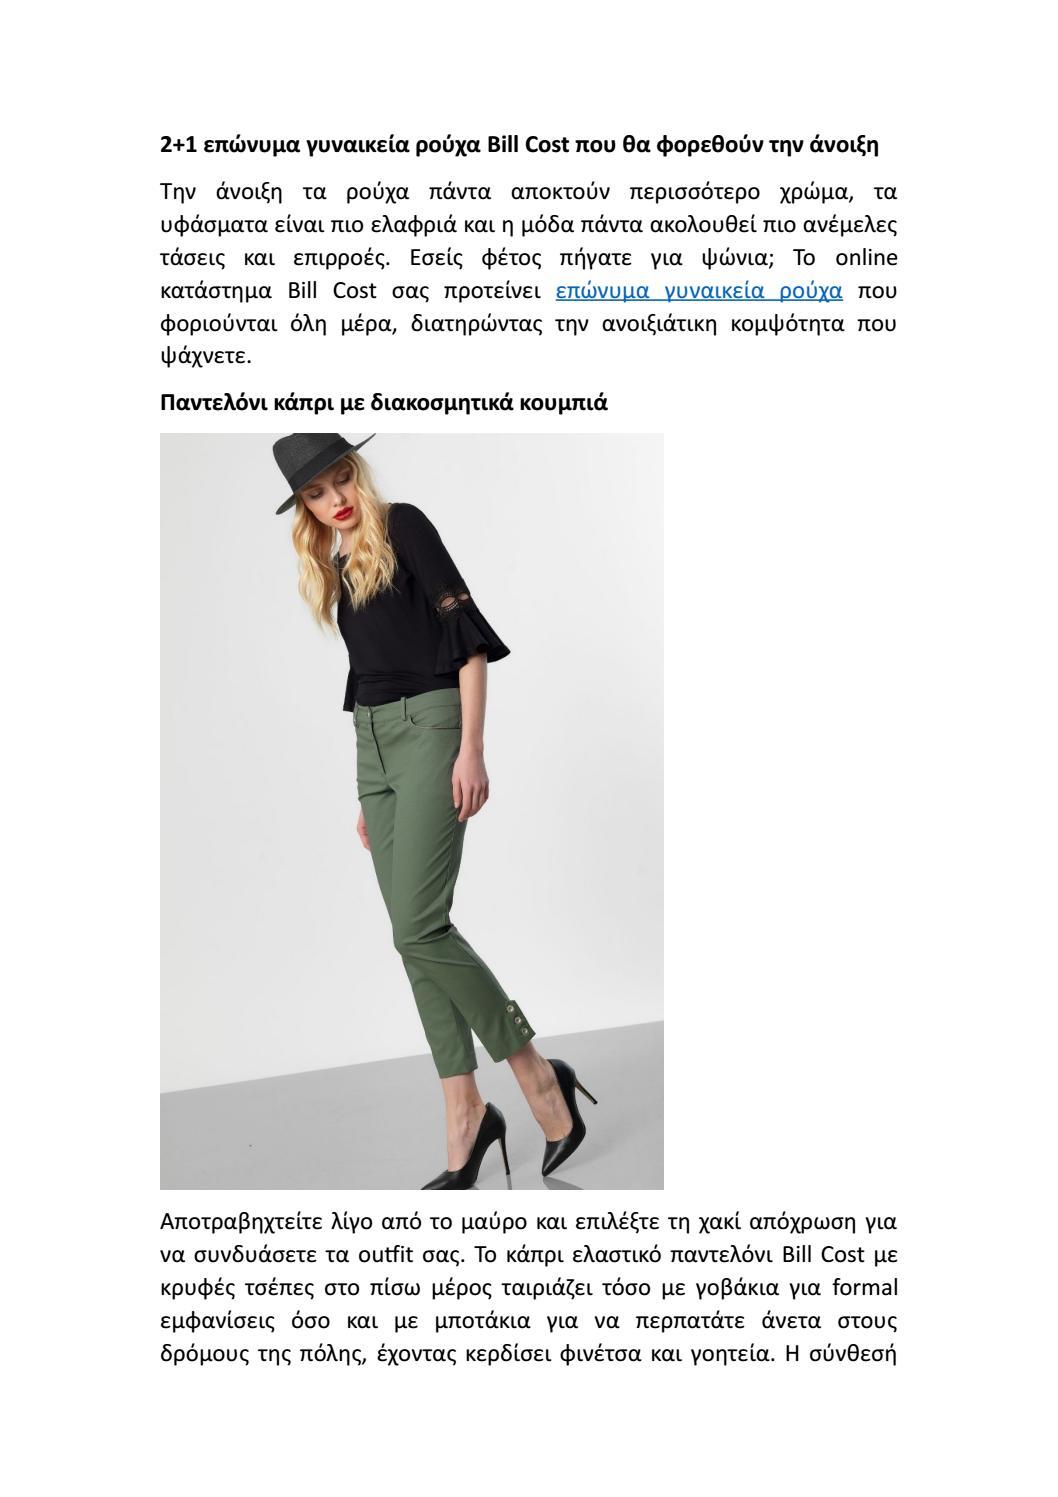 1fcc87d7957 2 1 επώνυμα γυναικεία ρούχα bill cost που θα φορεθούν την άνοιξη by  billcostgr - issuu